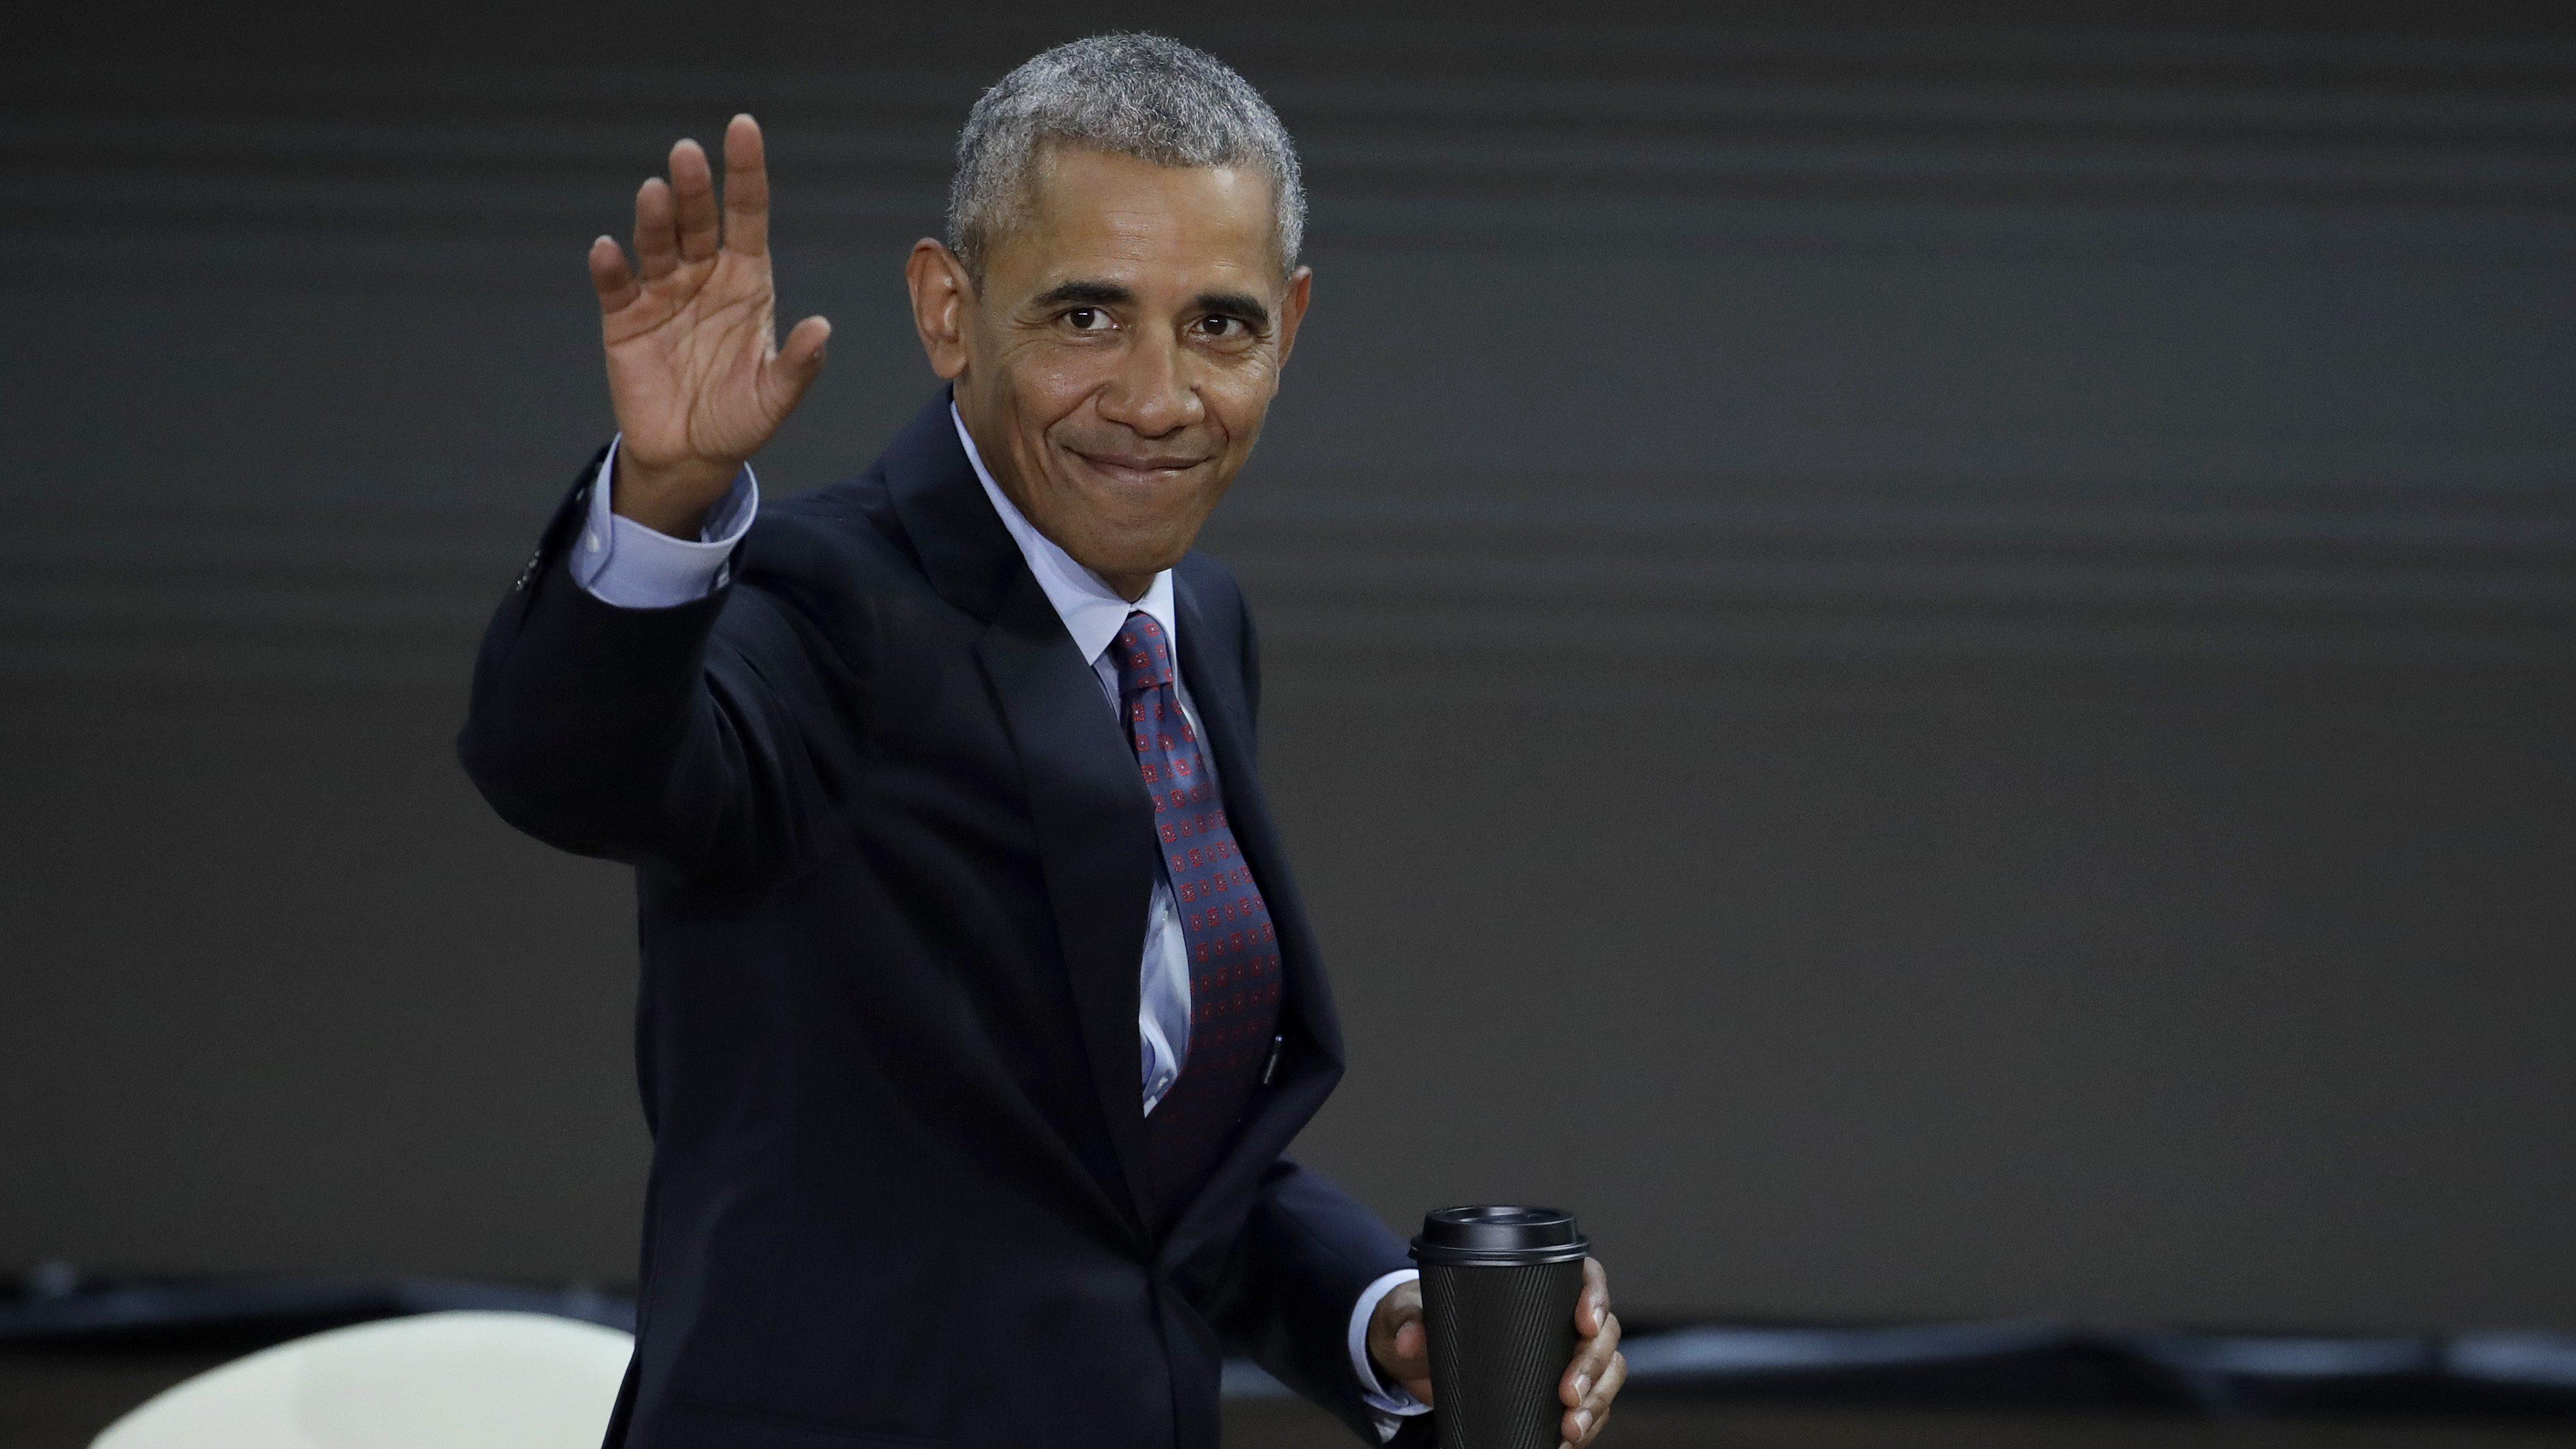 Barack Obama spoke with Bill and Melinda Gates